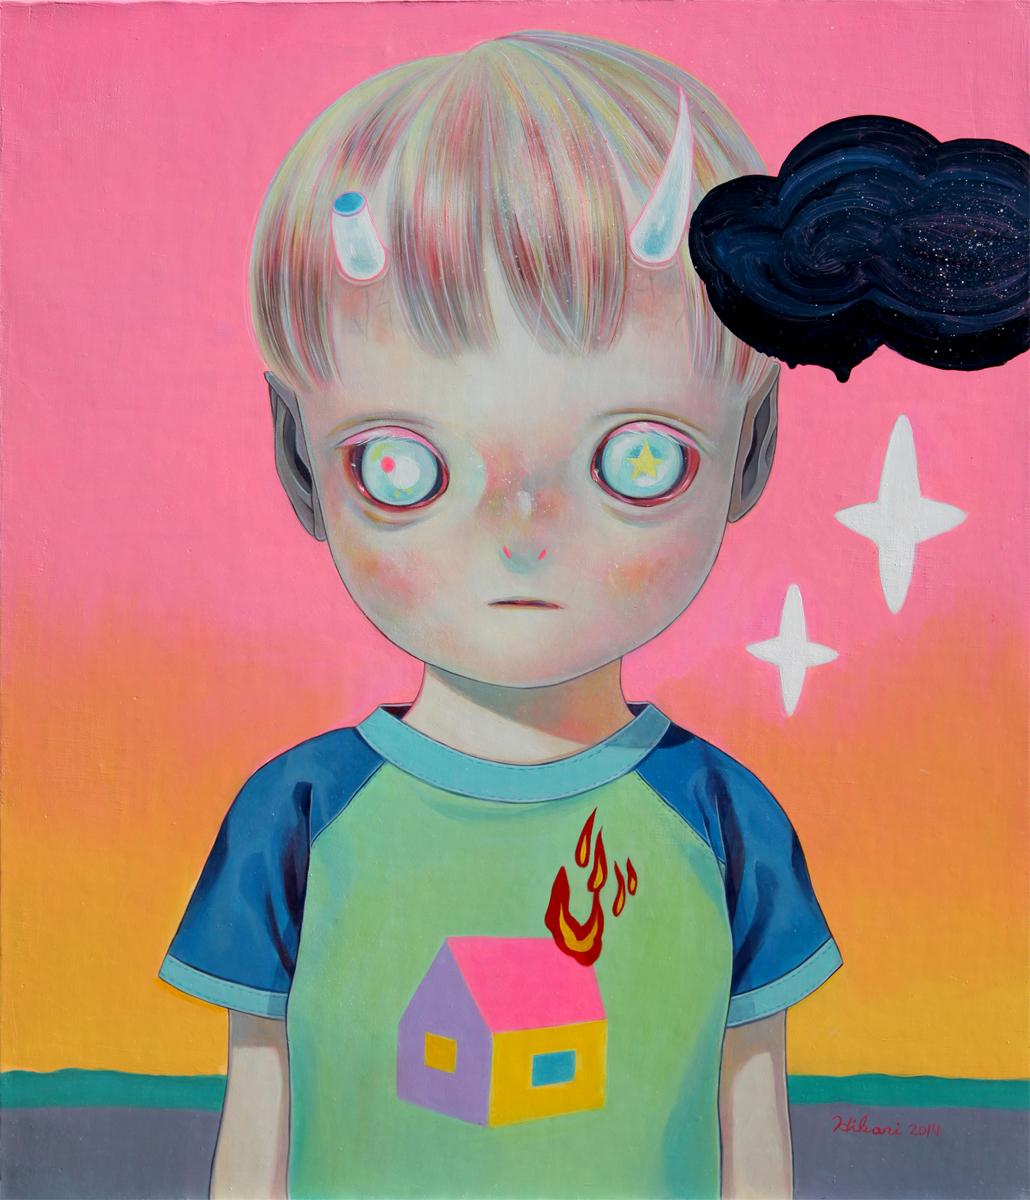 Hikari Shimoda 'Children of This Planet #25' (oil on canvas, 21 x 18 inches, 2014).jpg